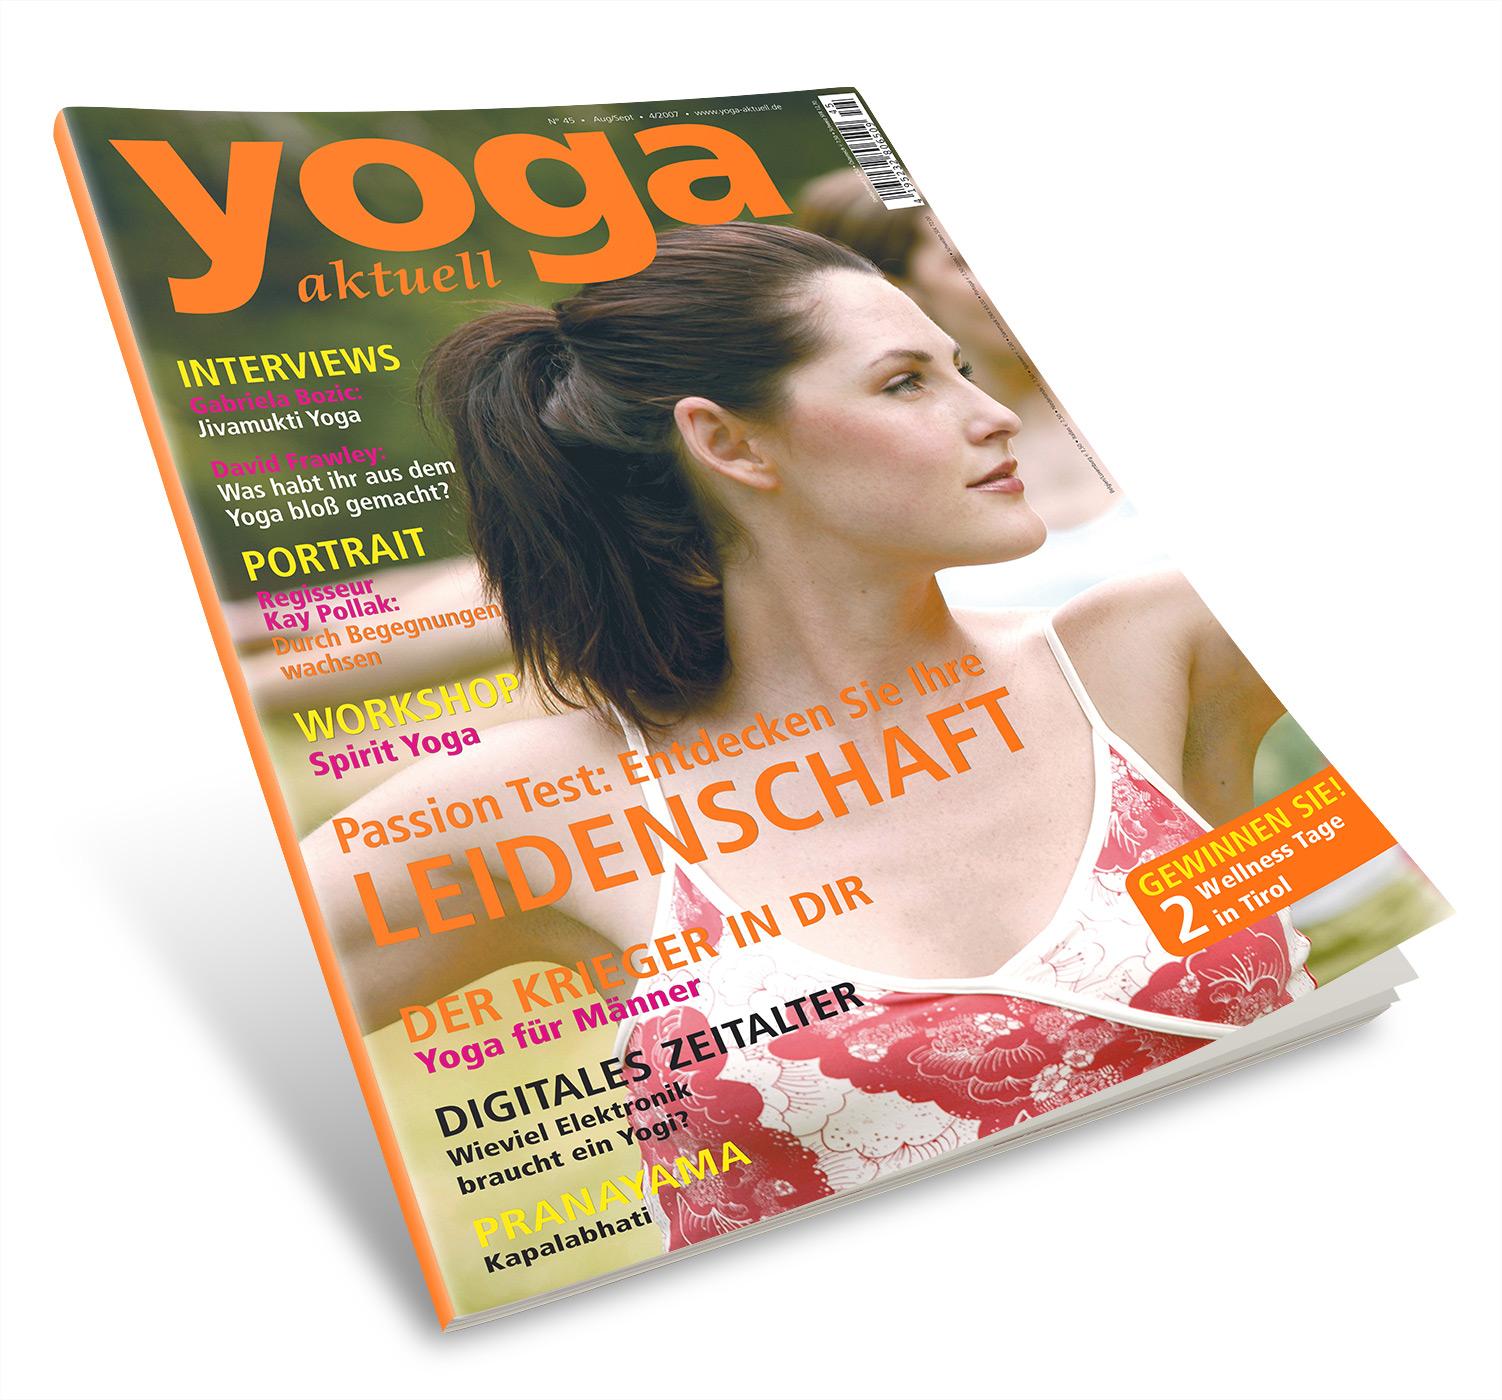 Yoga Aktuell 45 - 04/2007